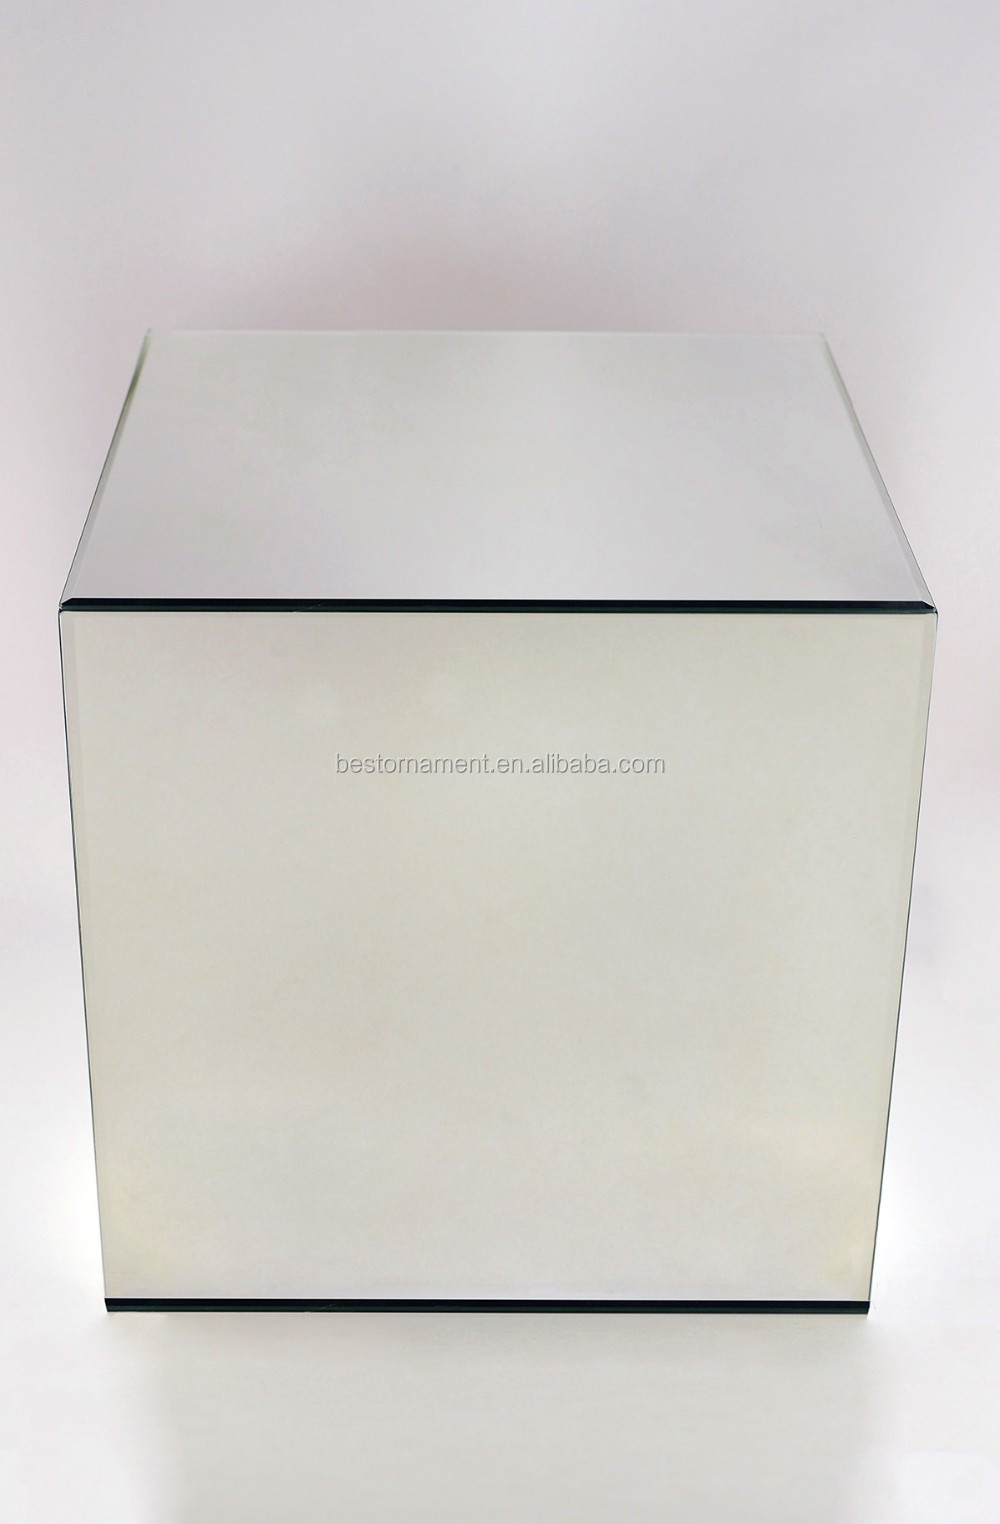 Kare Ayna Vazo Y 252 Kselticiler K 252 P Buy Product On Alibaba Com